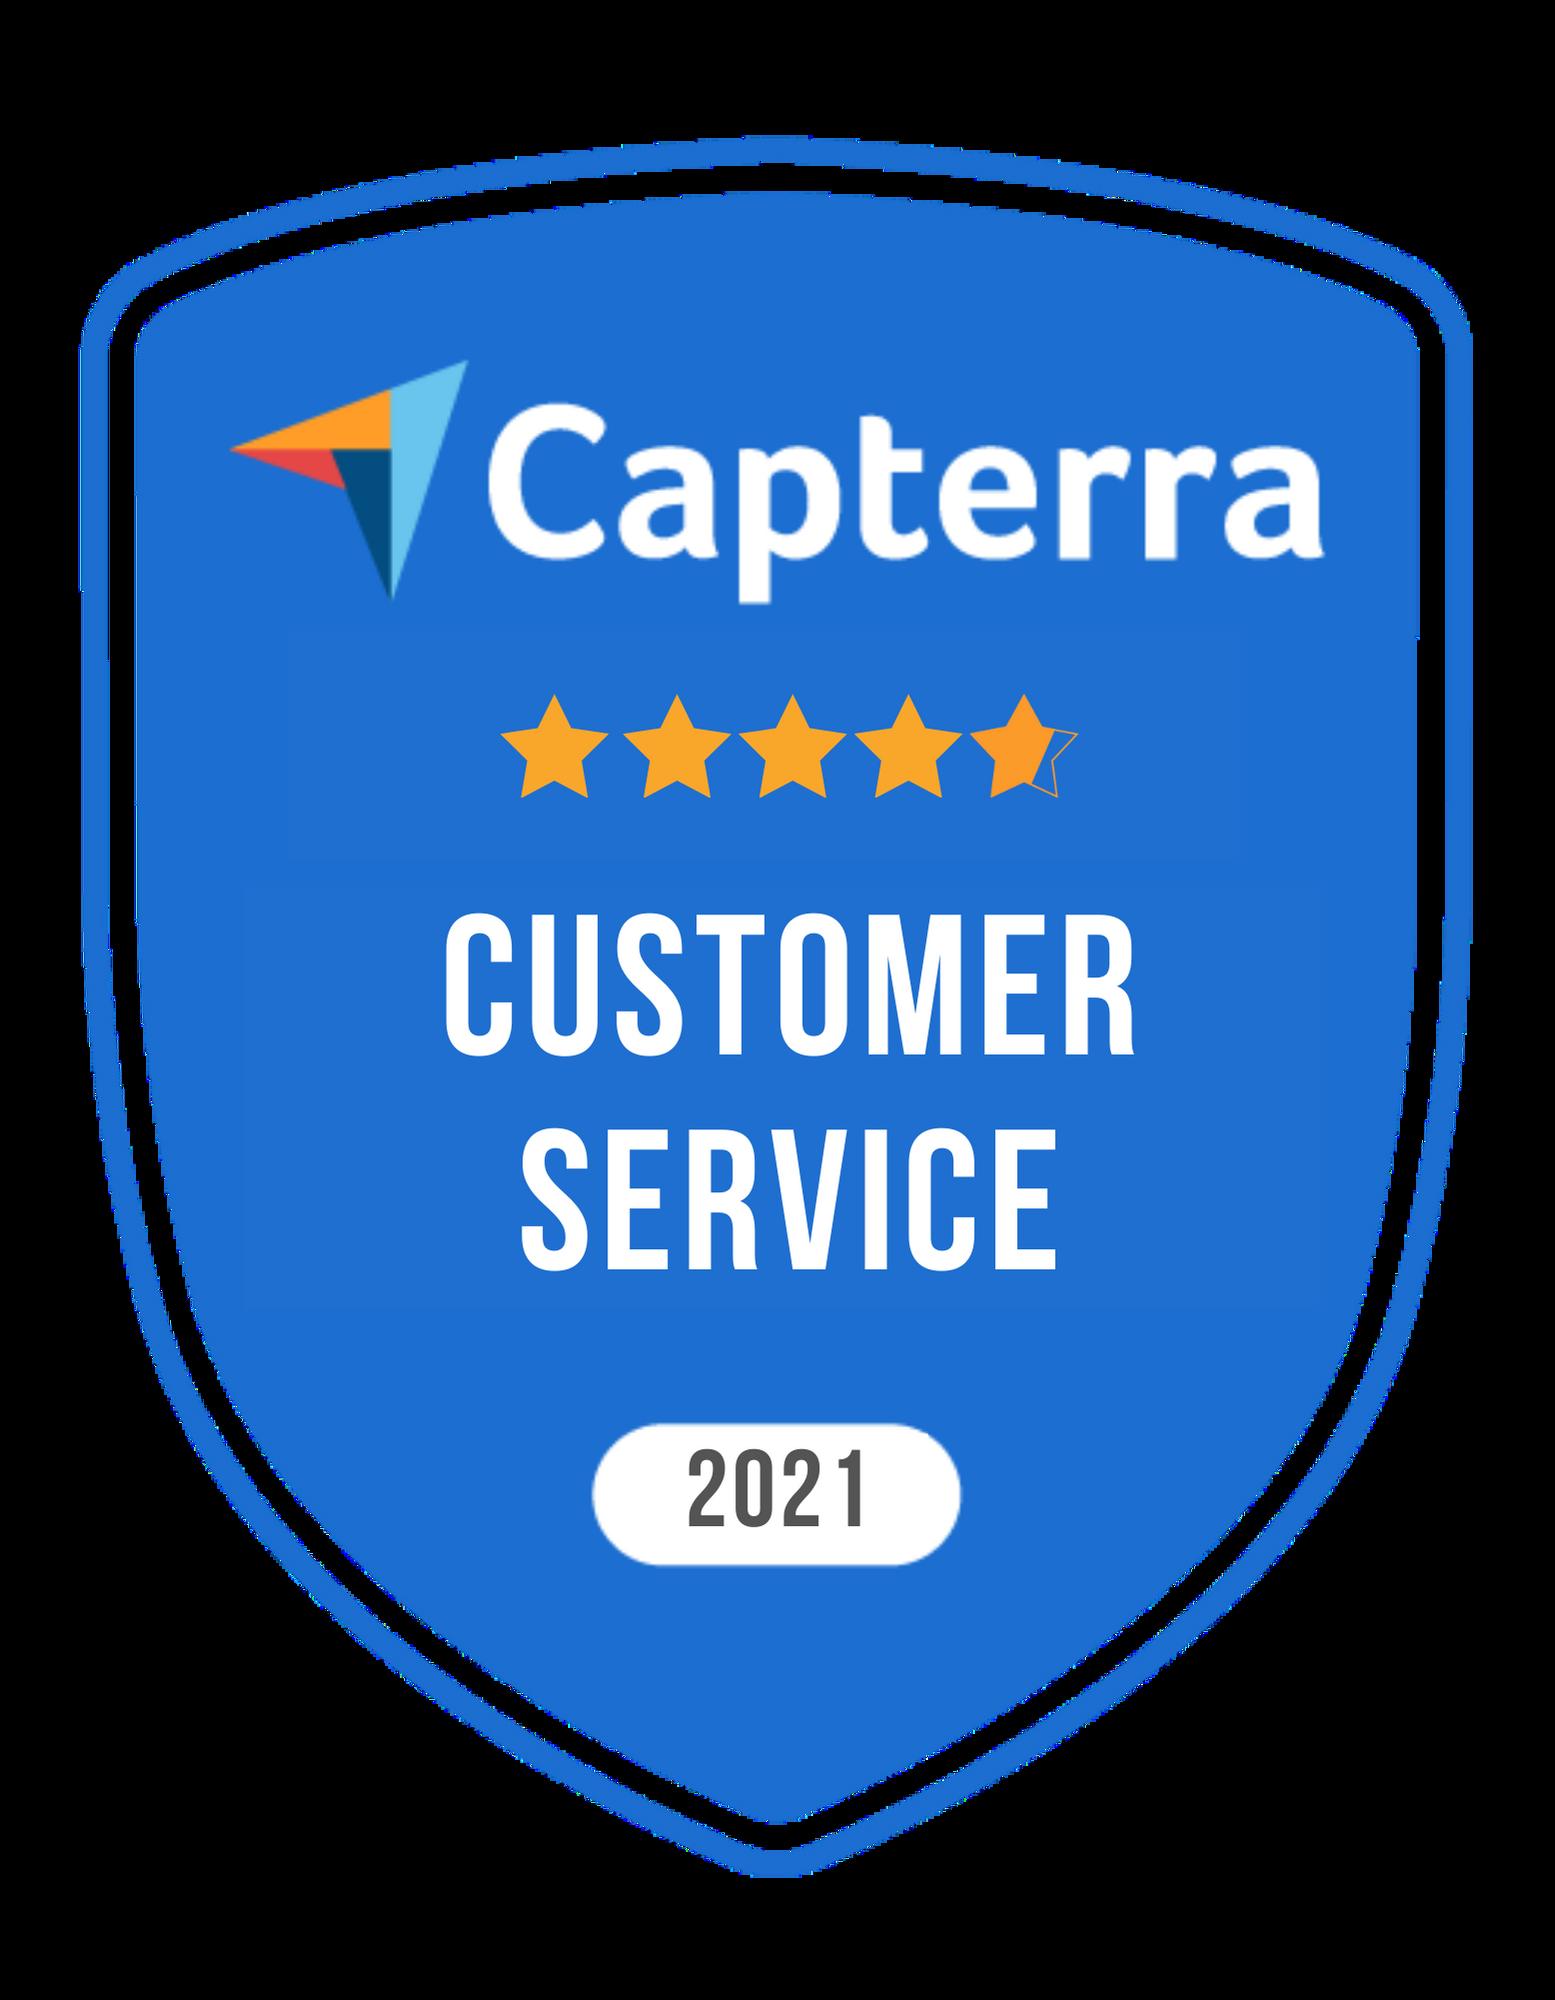 Best Customer Service on Capterra